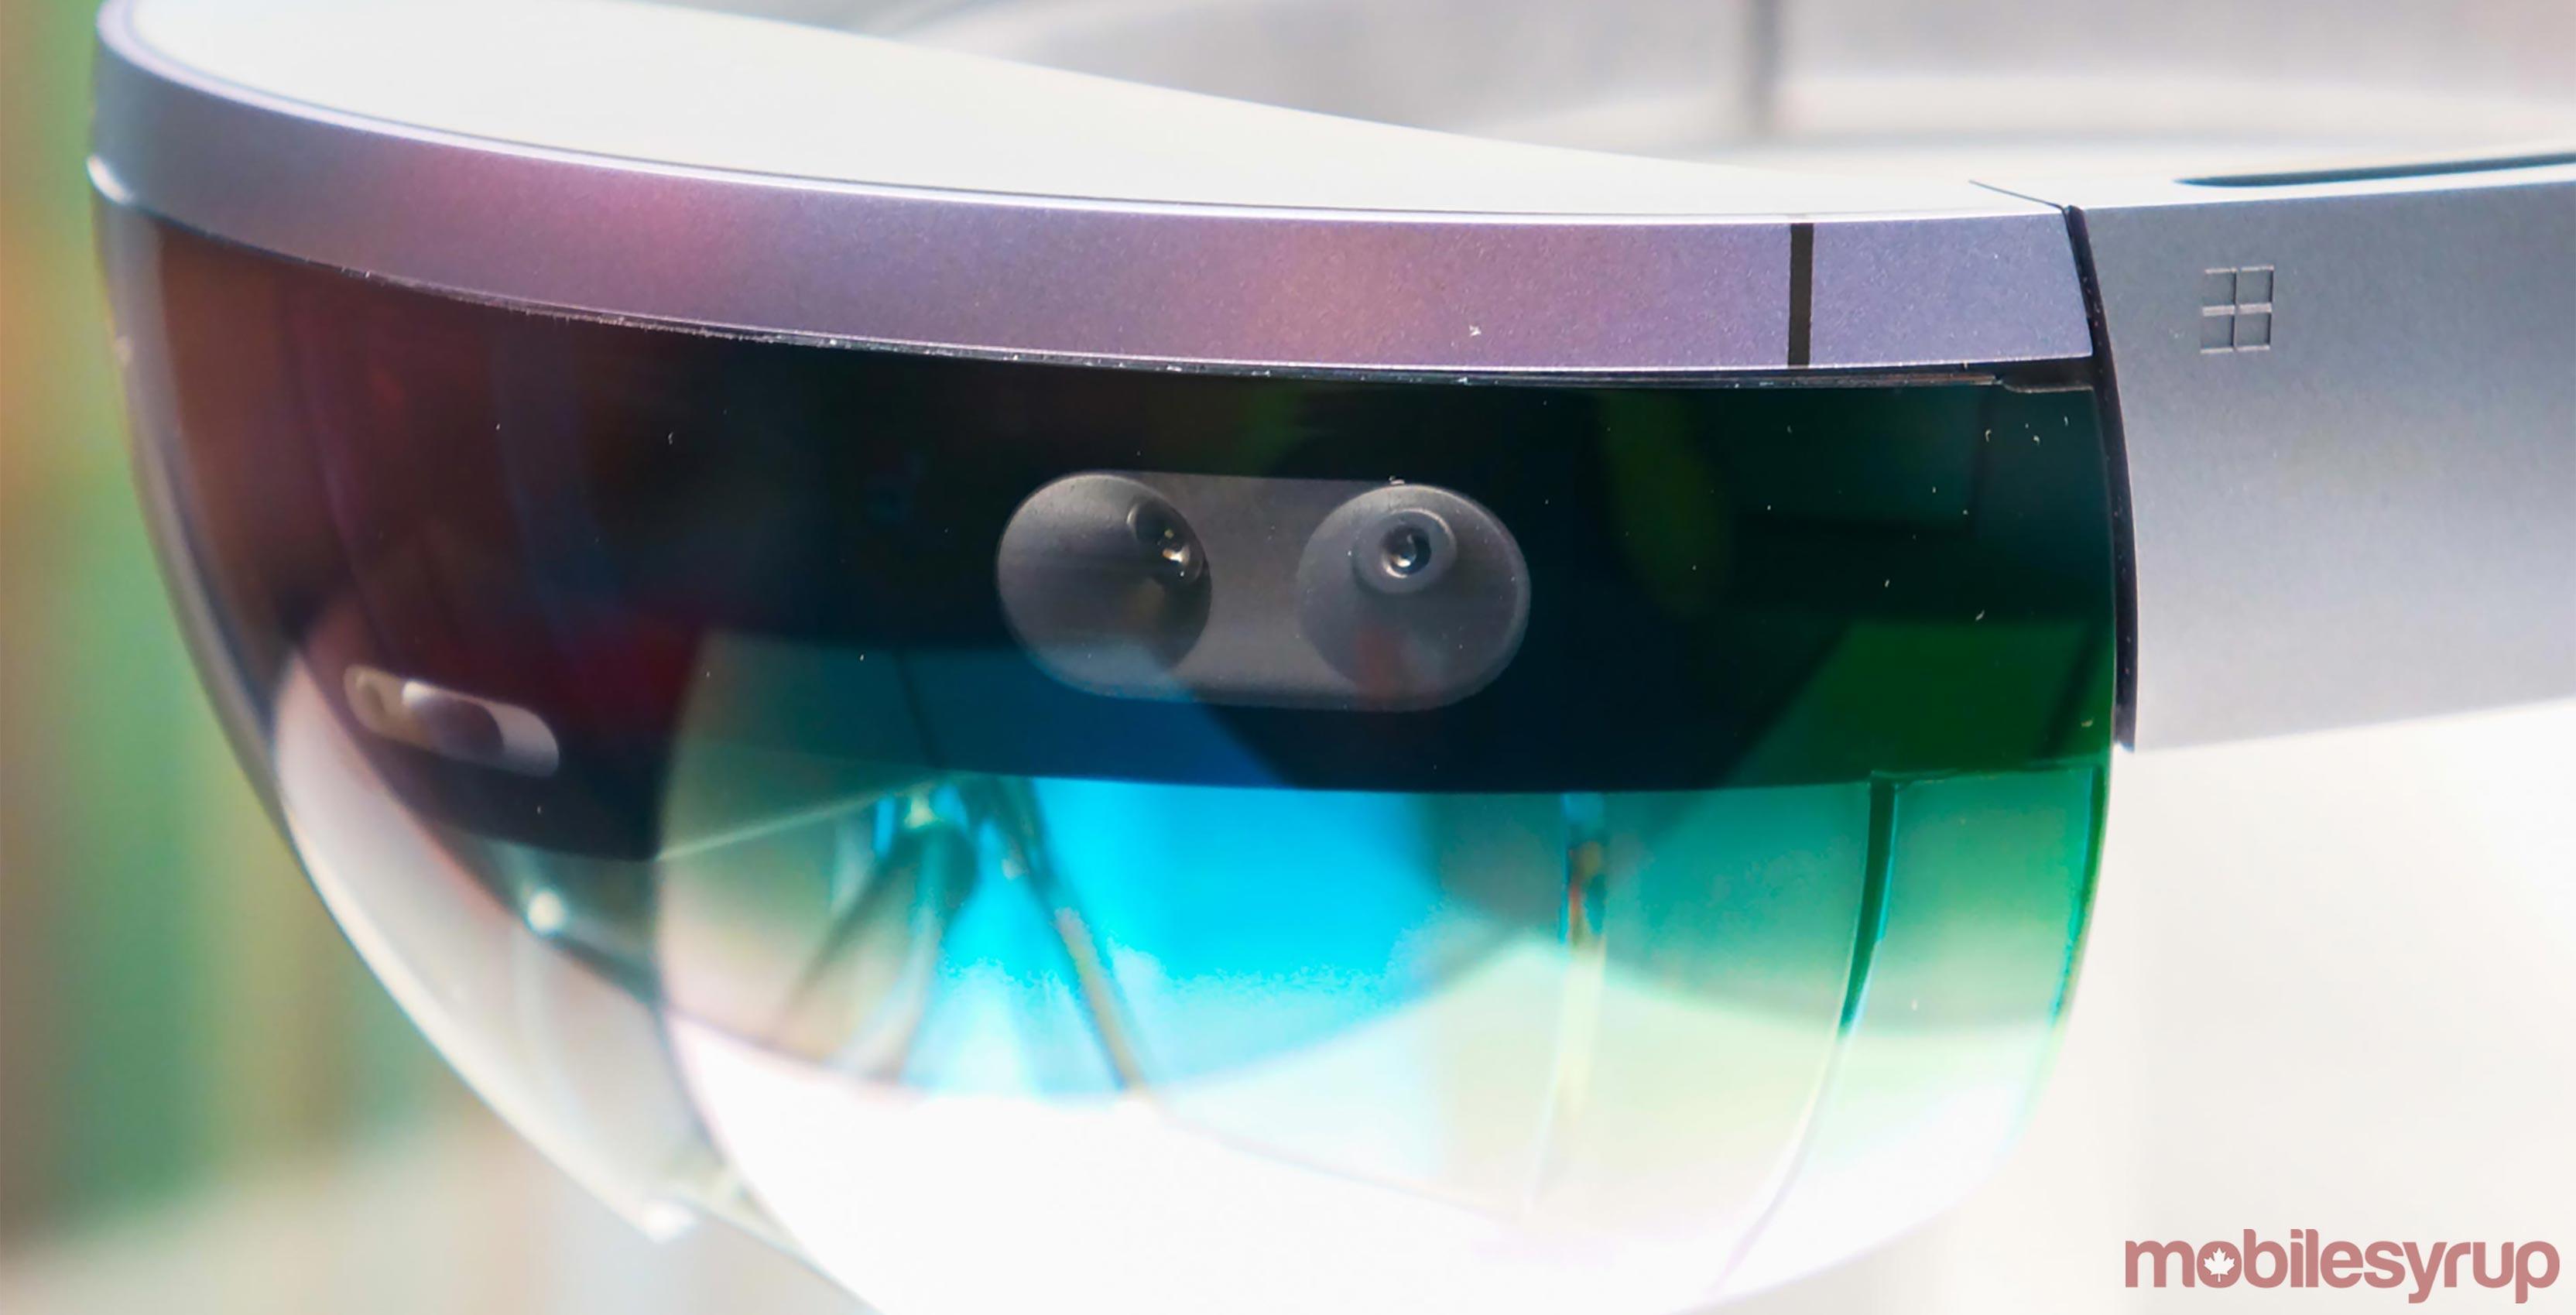 Photo of Microsoft's HoloLens AR headset